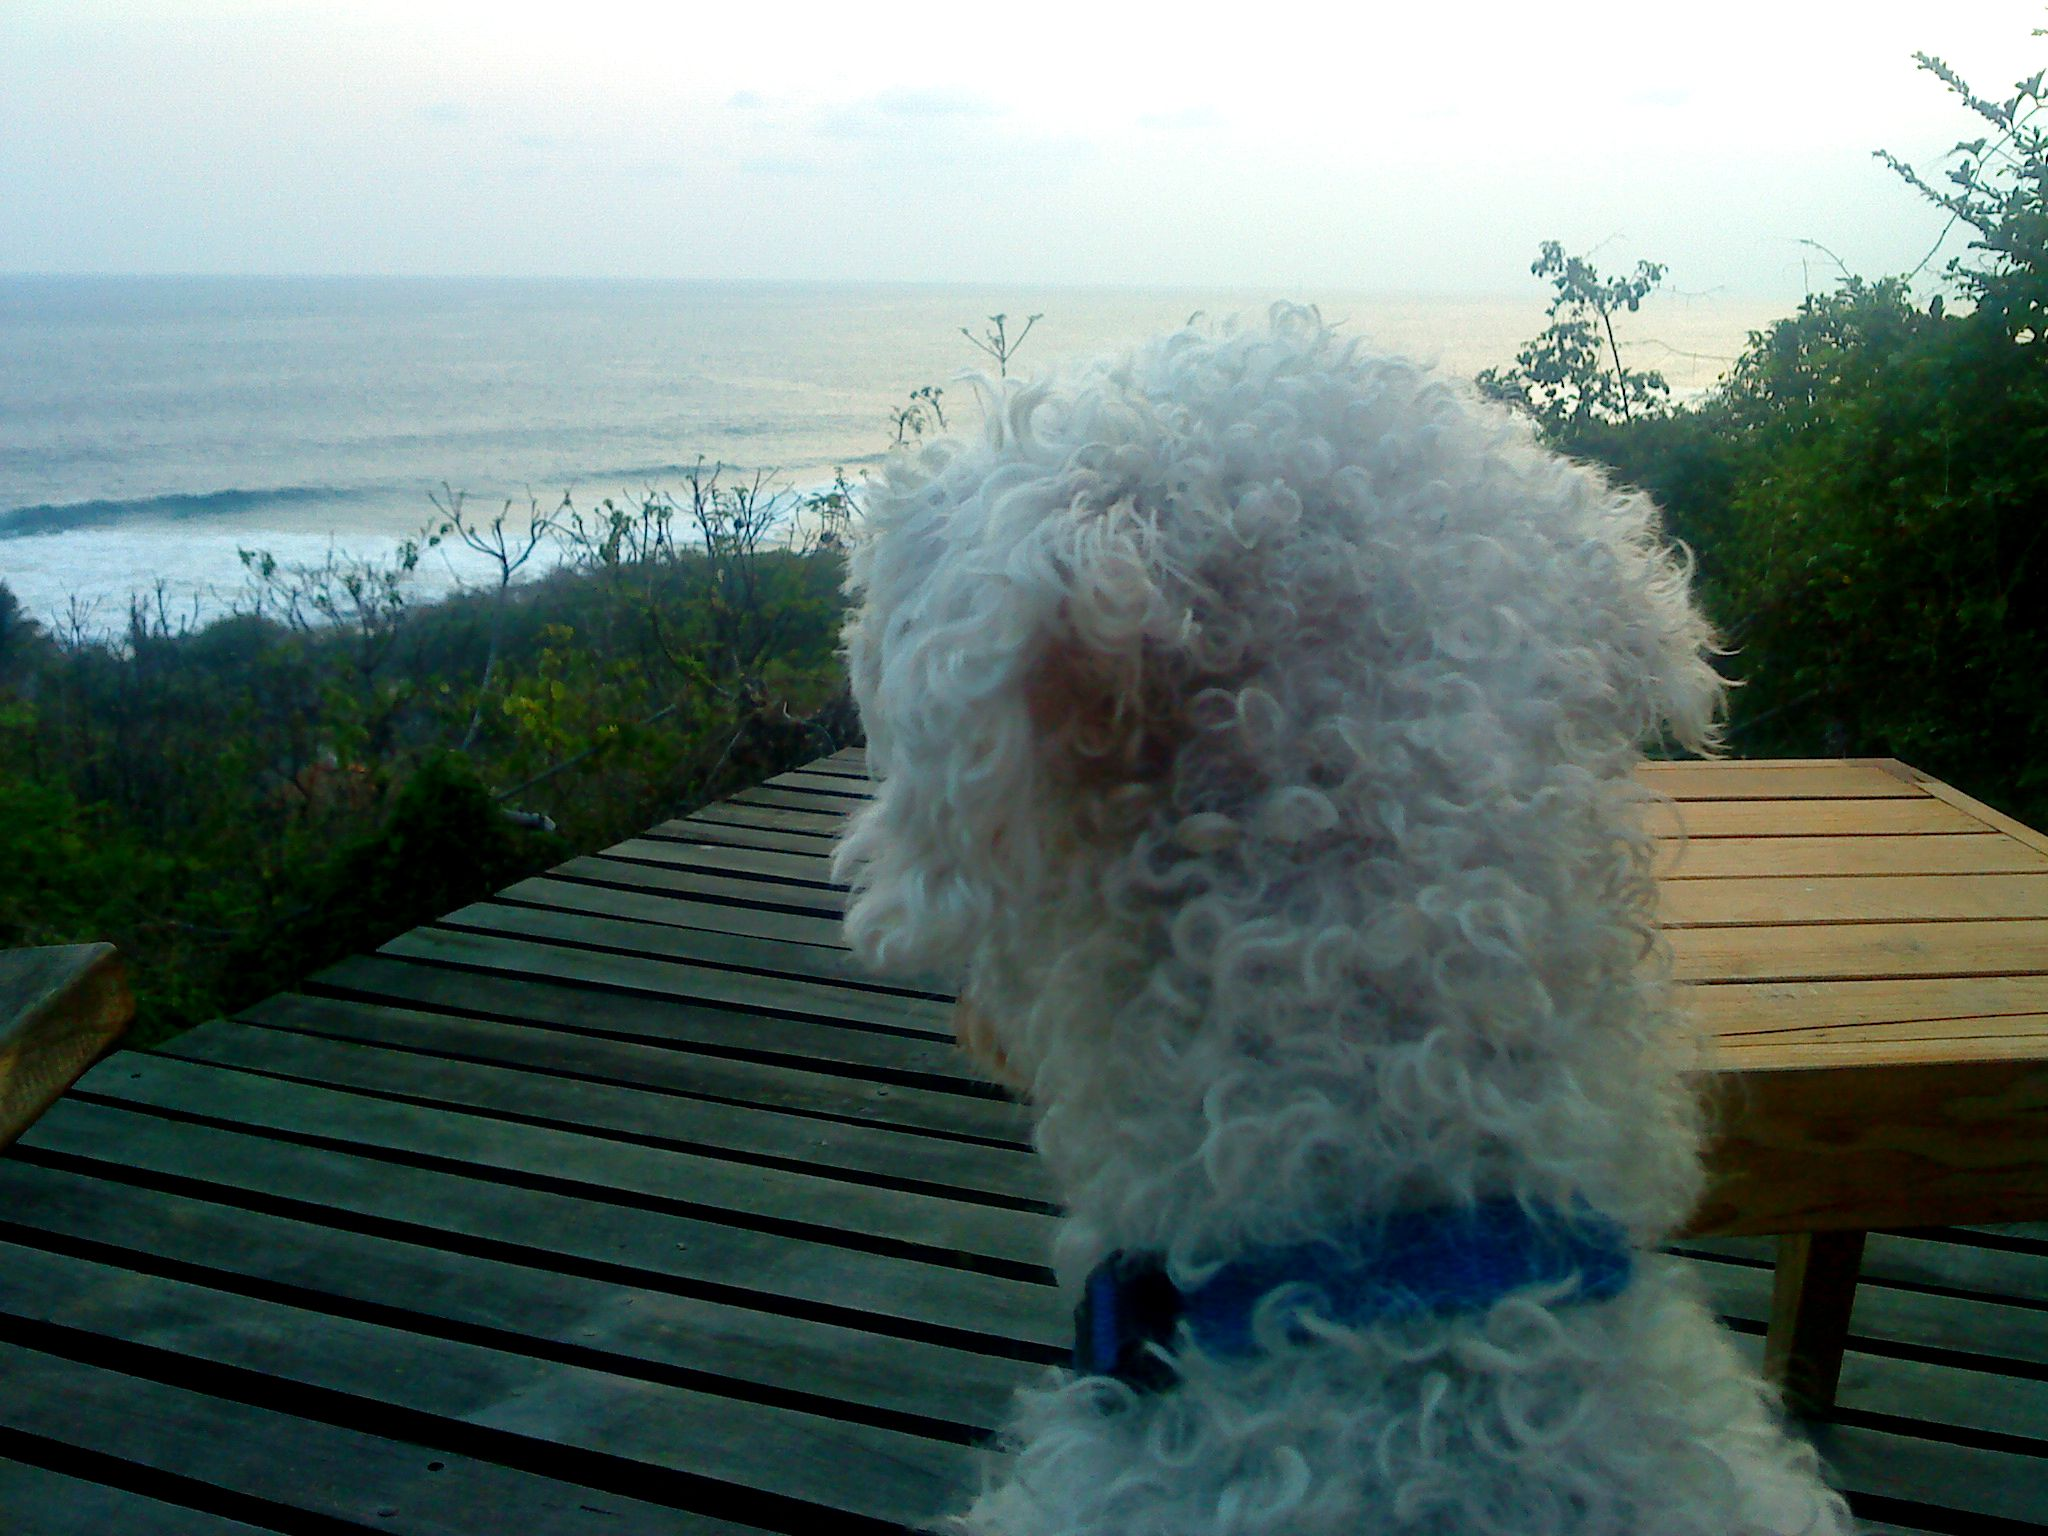 casa mermejita mazunte oaxaca mexico pata de perro blog de viajes5